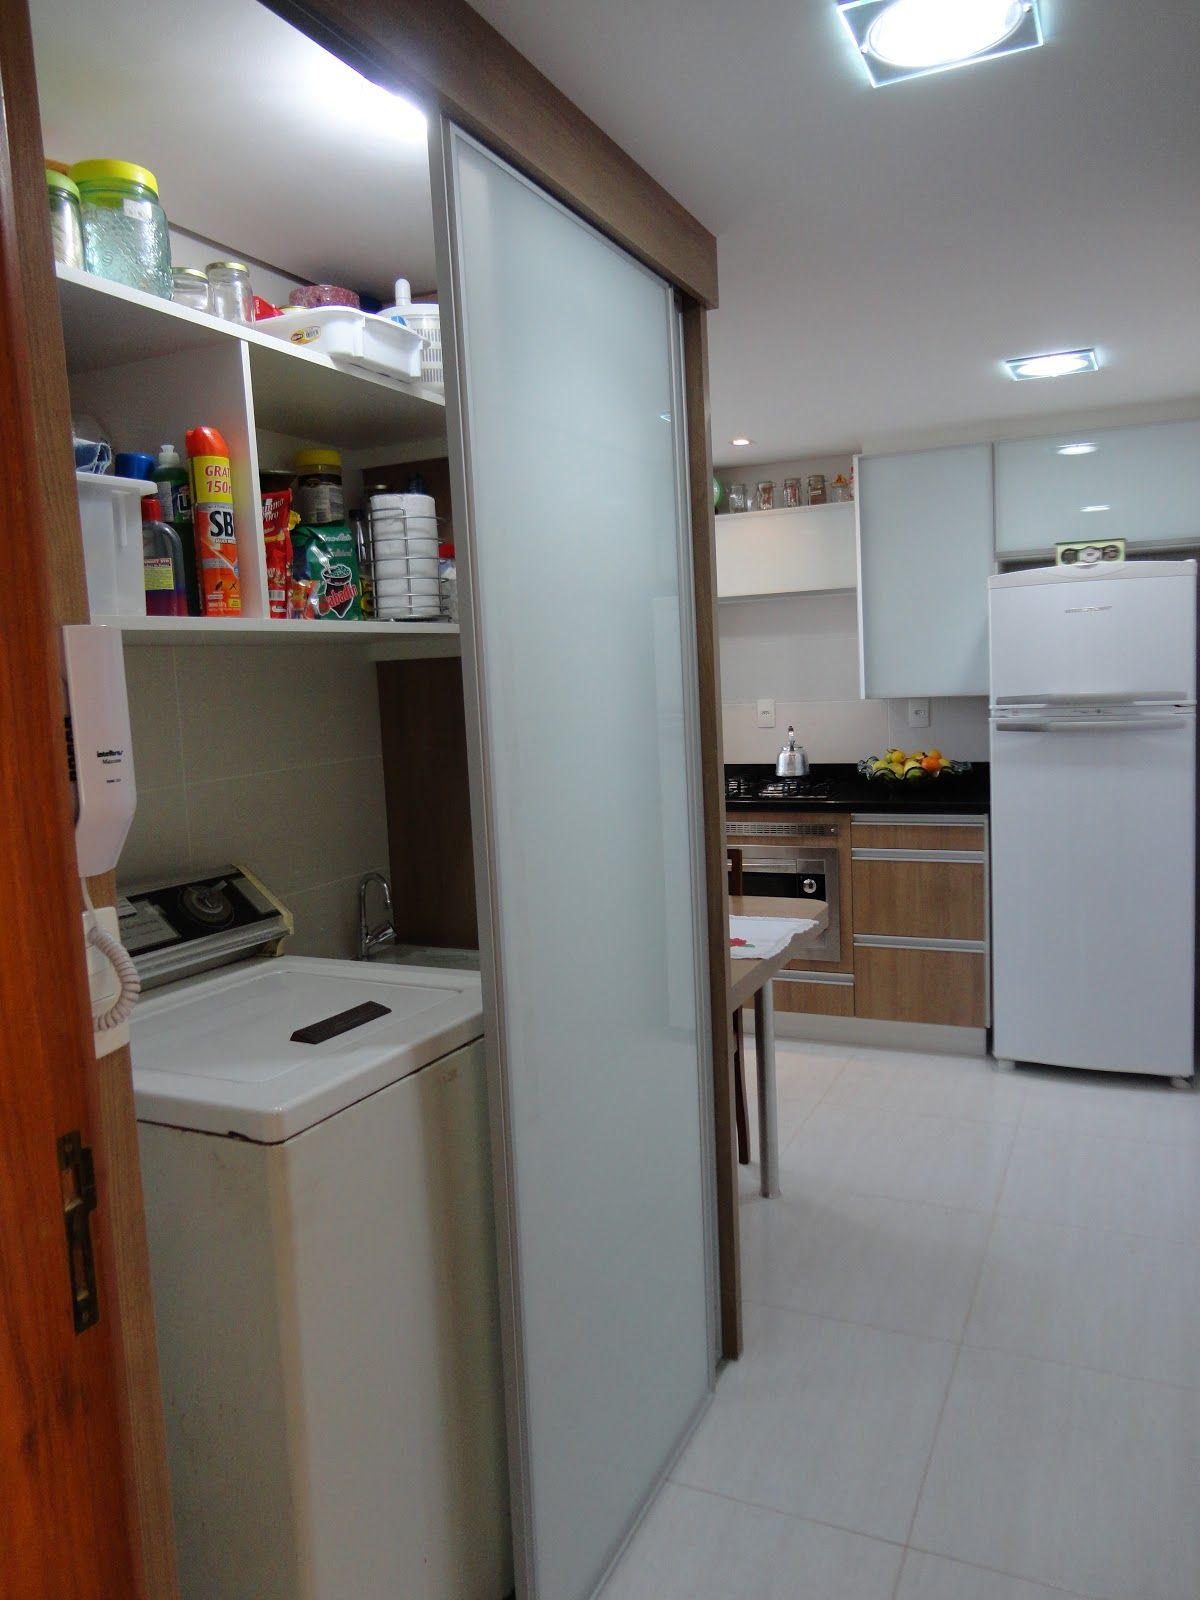 Pin by hjoshi on hjoshi.home | Pinterest | Laundry, Laundry rooms ...